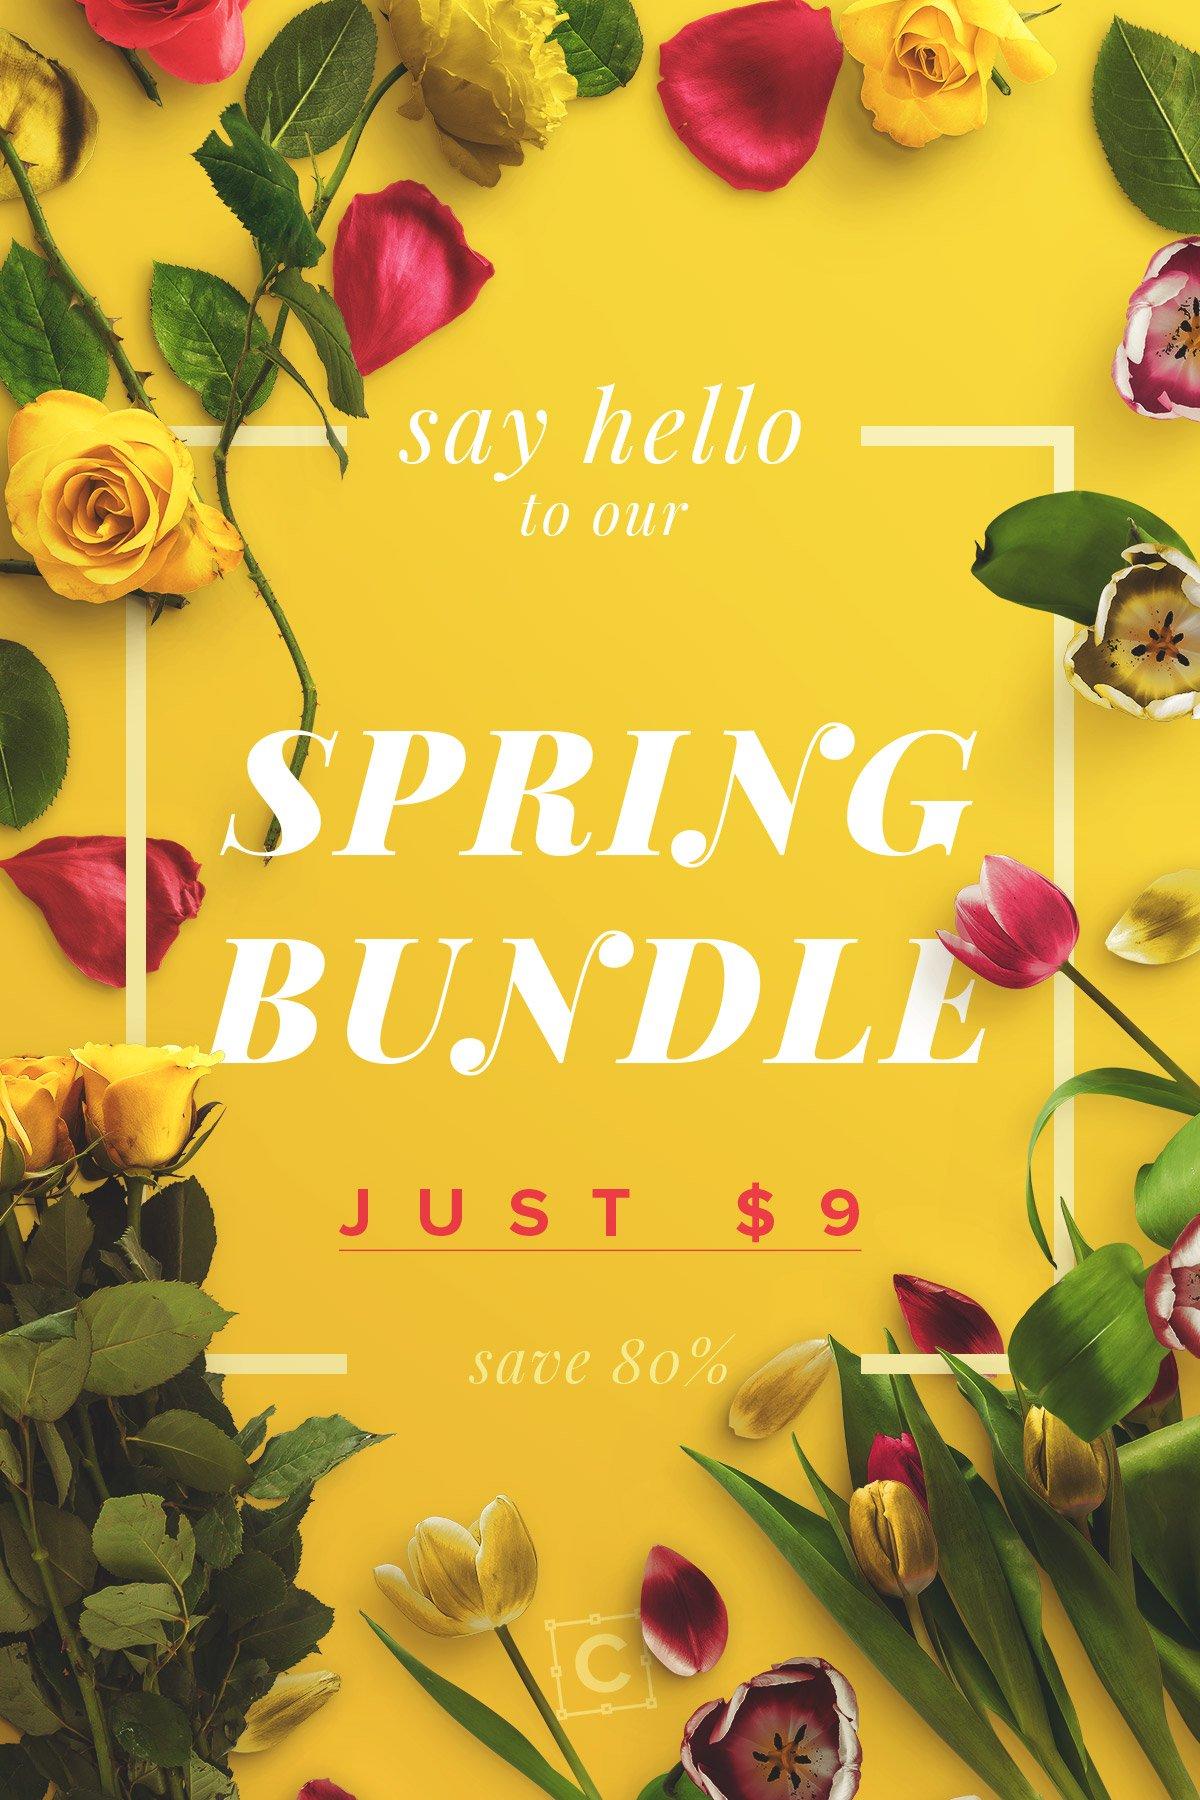 spring bundle customscene 3x2